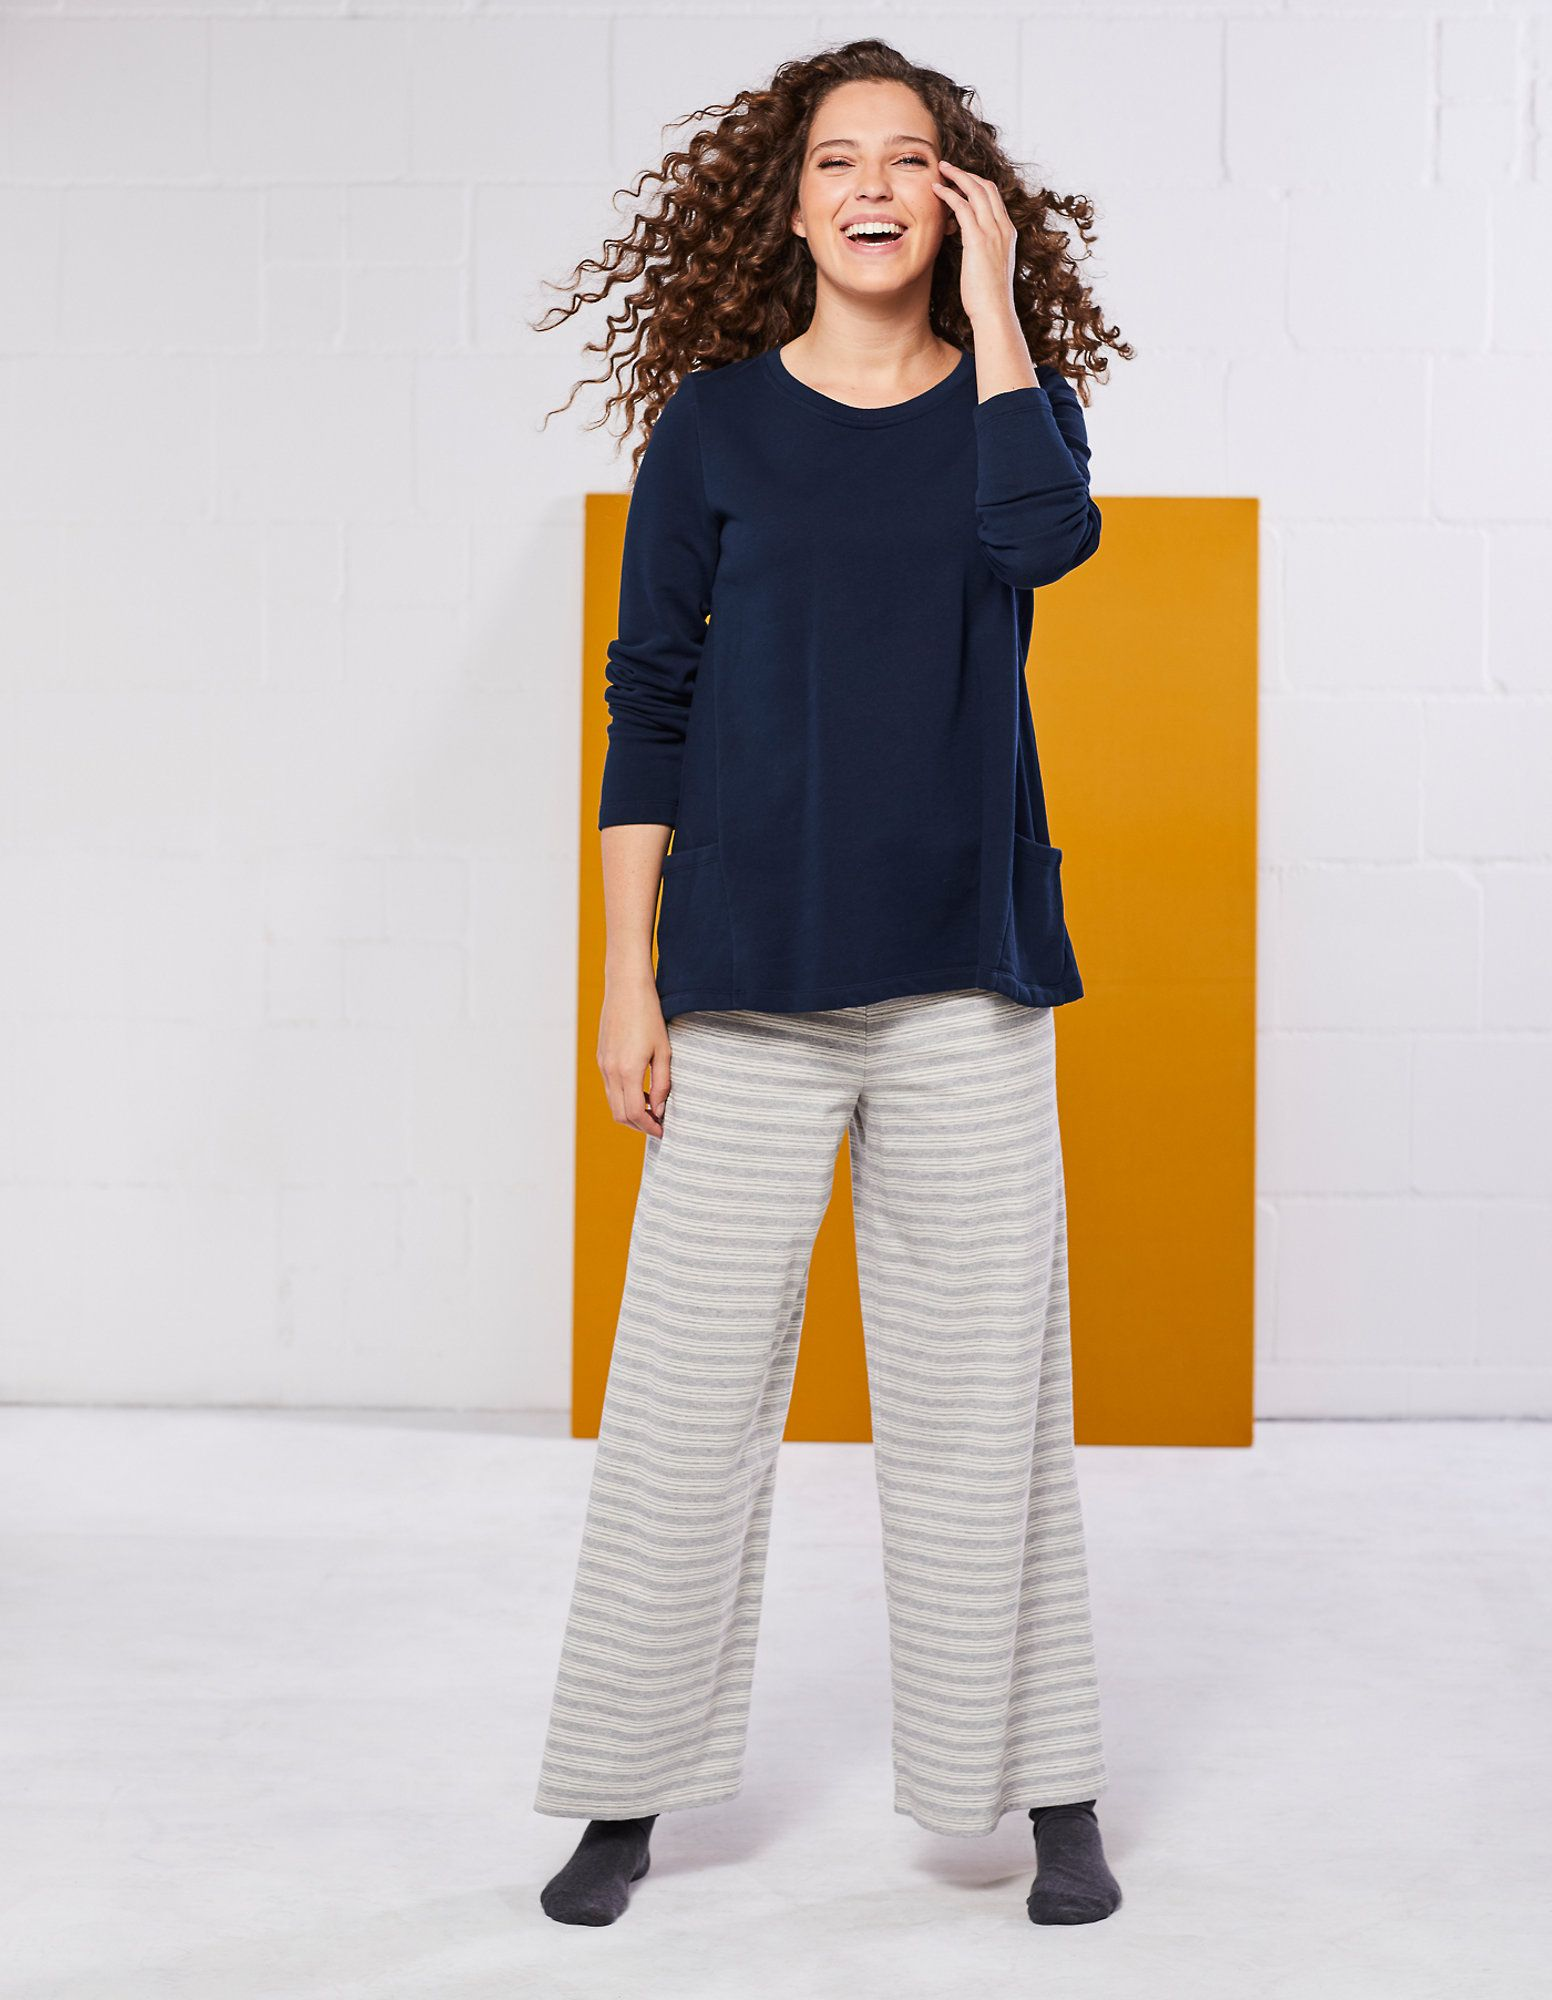 Deerberg Jersey Hose Domenika Hosen Kleidung Mode